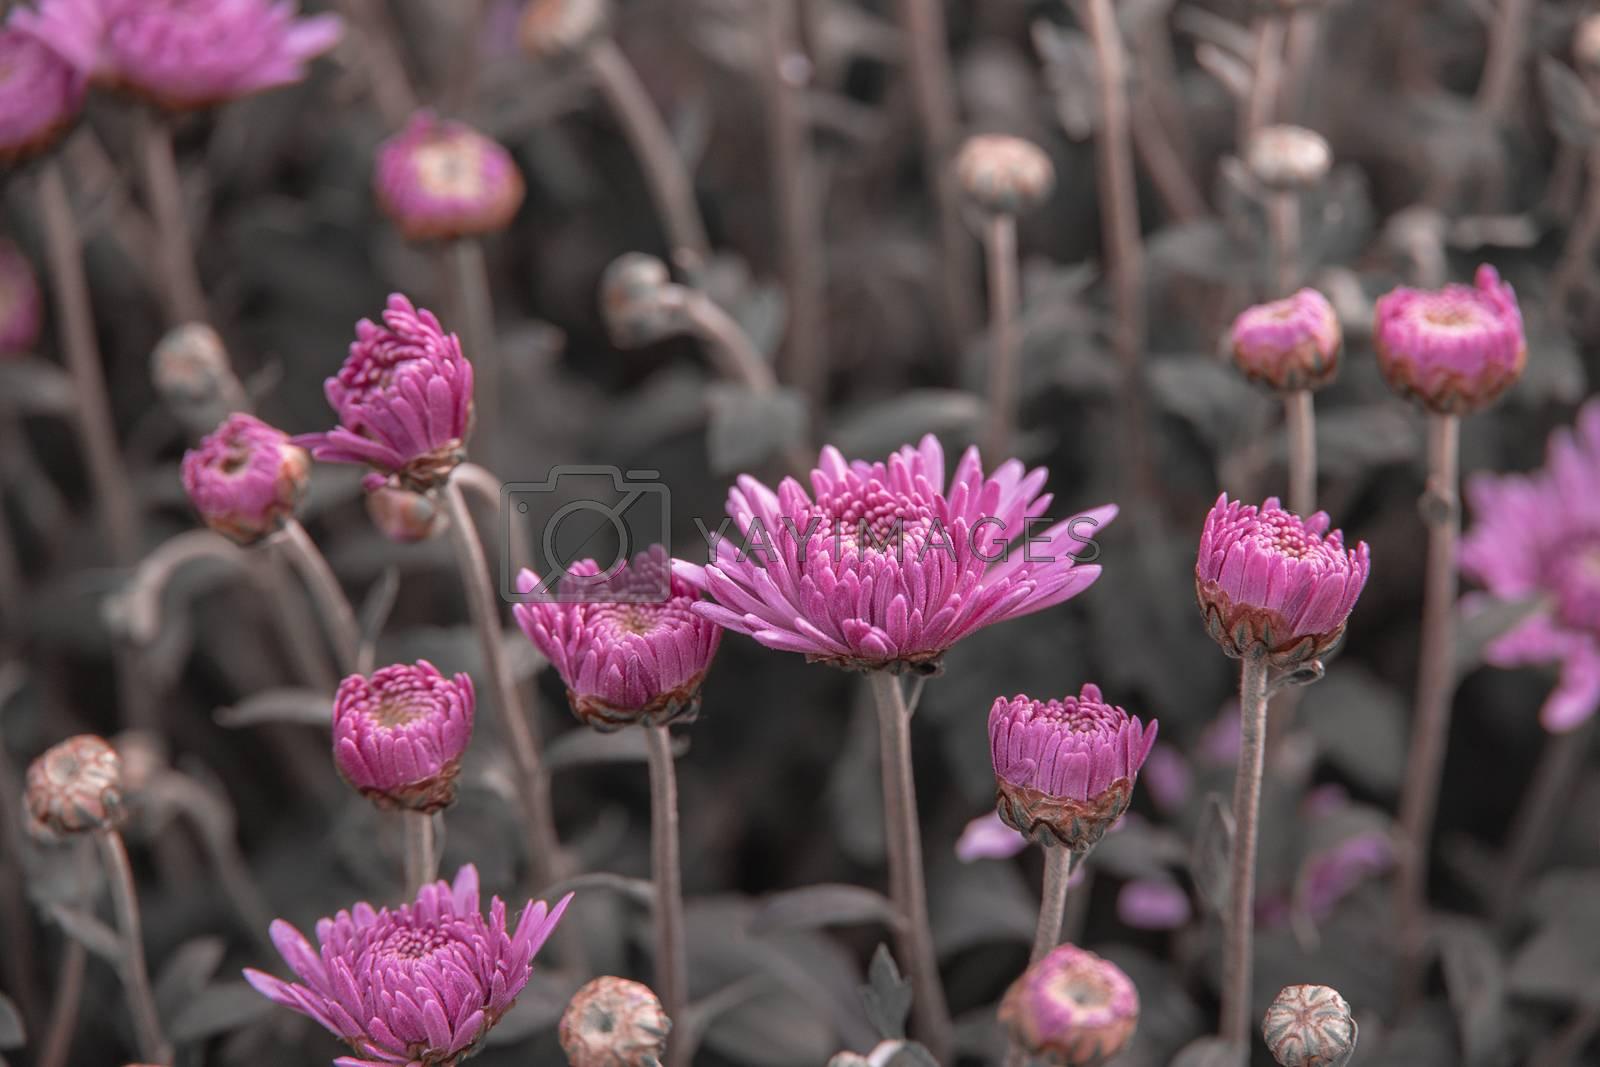 Royalty free image of  autumn purple chrysanthemum flowers in closeup by Lukrecja